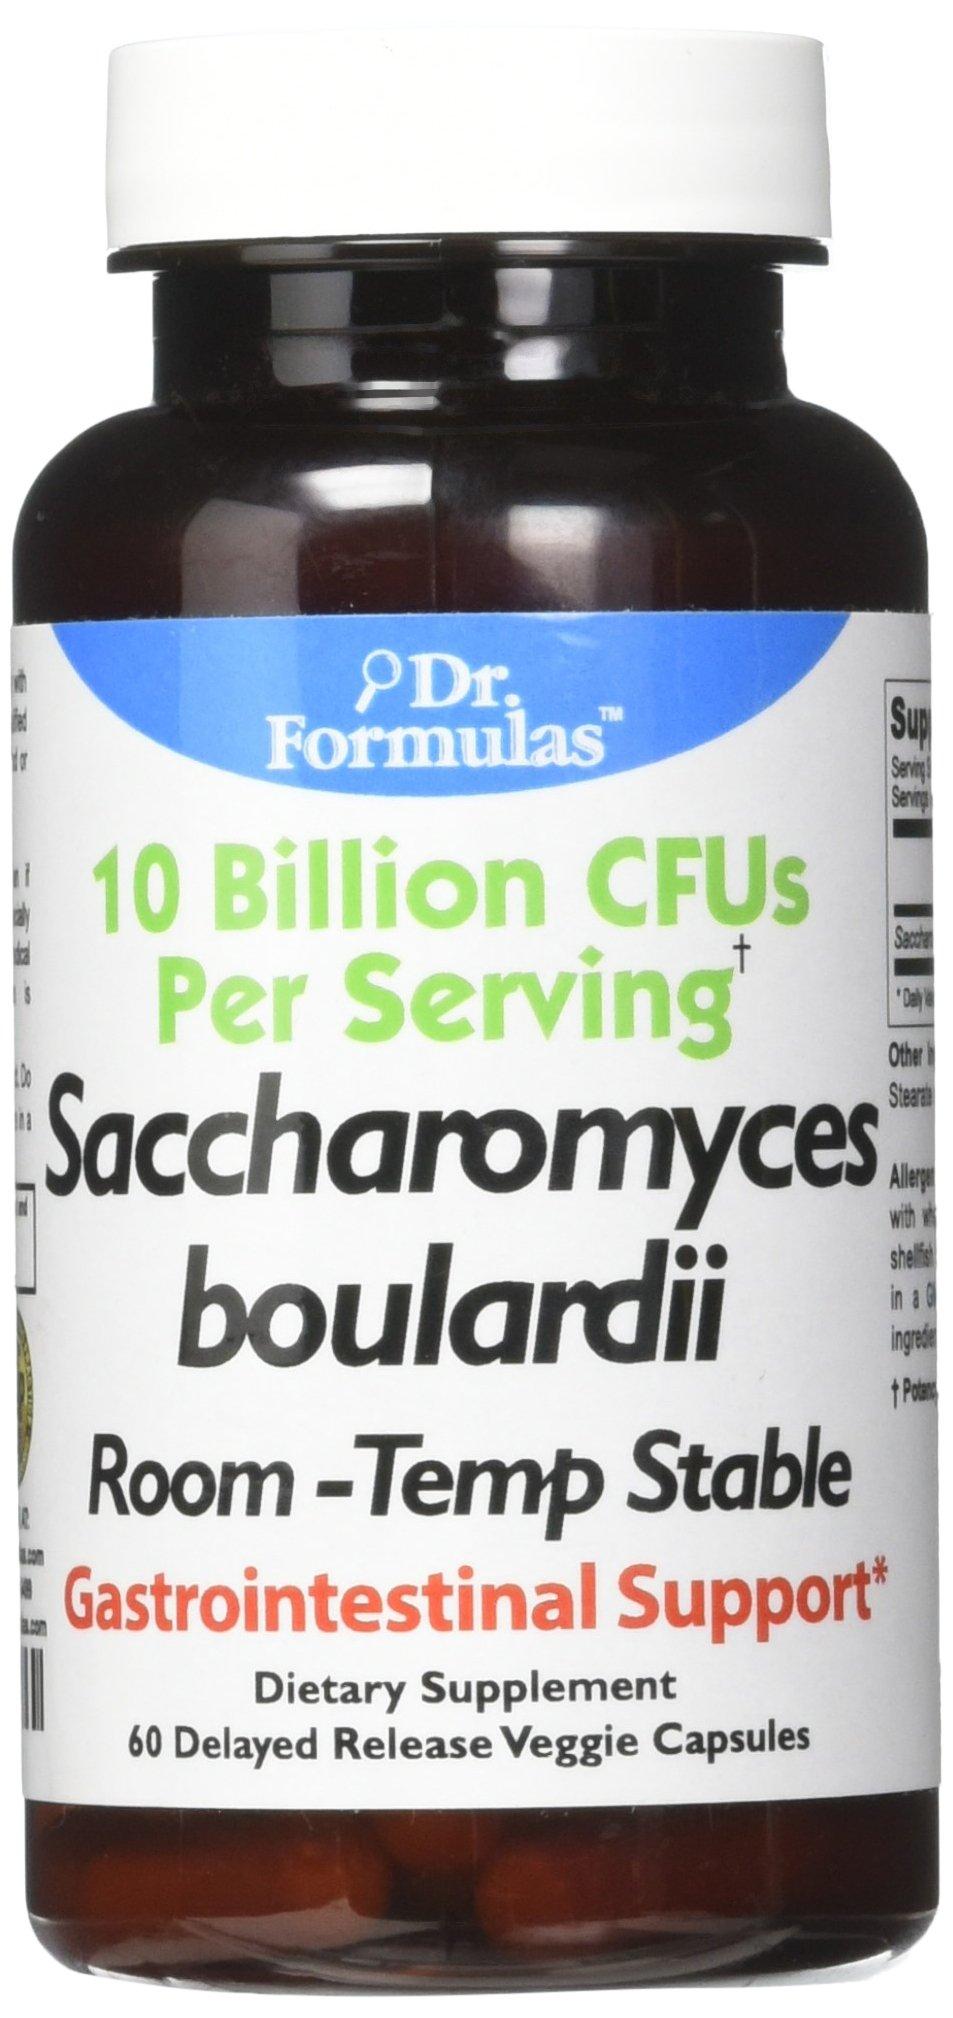 DrFormulas Nexabiotic Saccharomyces Boulardii Probiotics 10 Billion CFUs (Just S boulardii), Intestinal and Digestive Support Supplement, 60 Stomach Acid Resistant Probiotic Capsules …